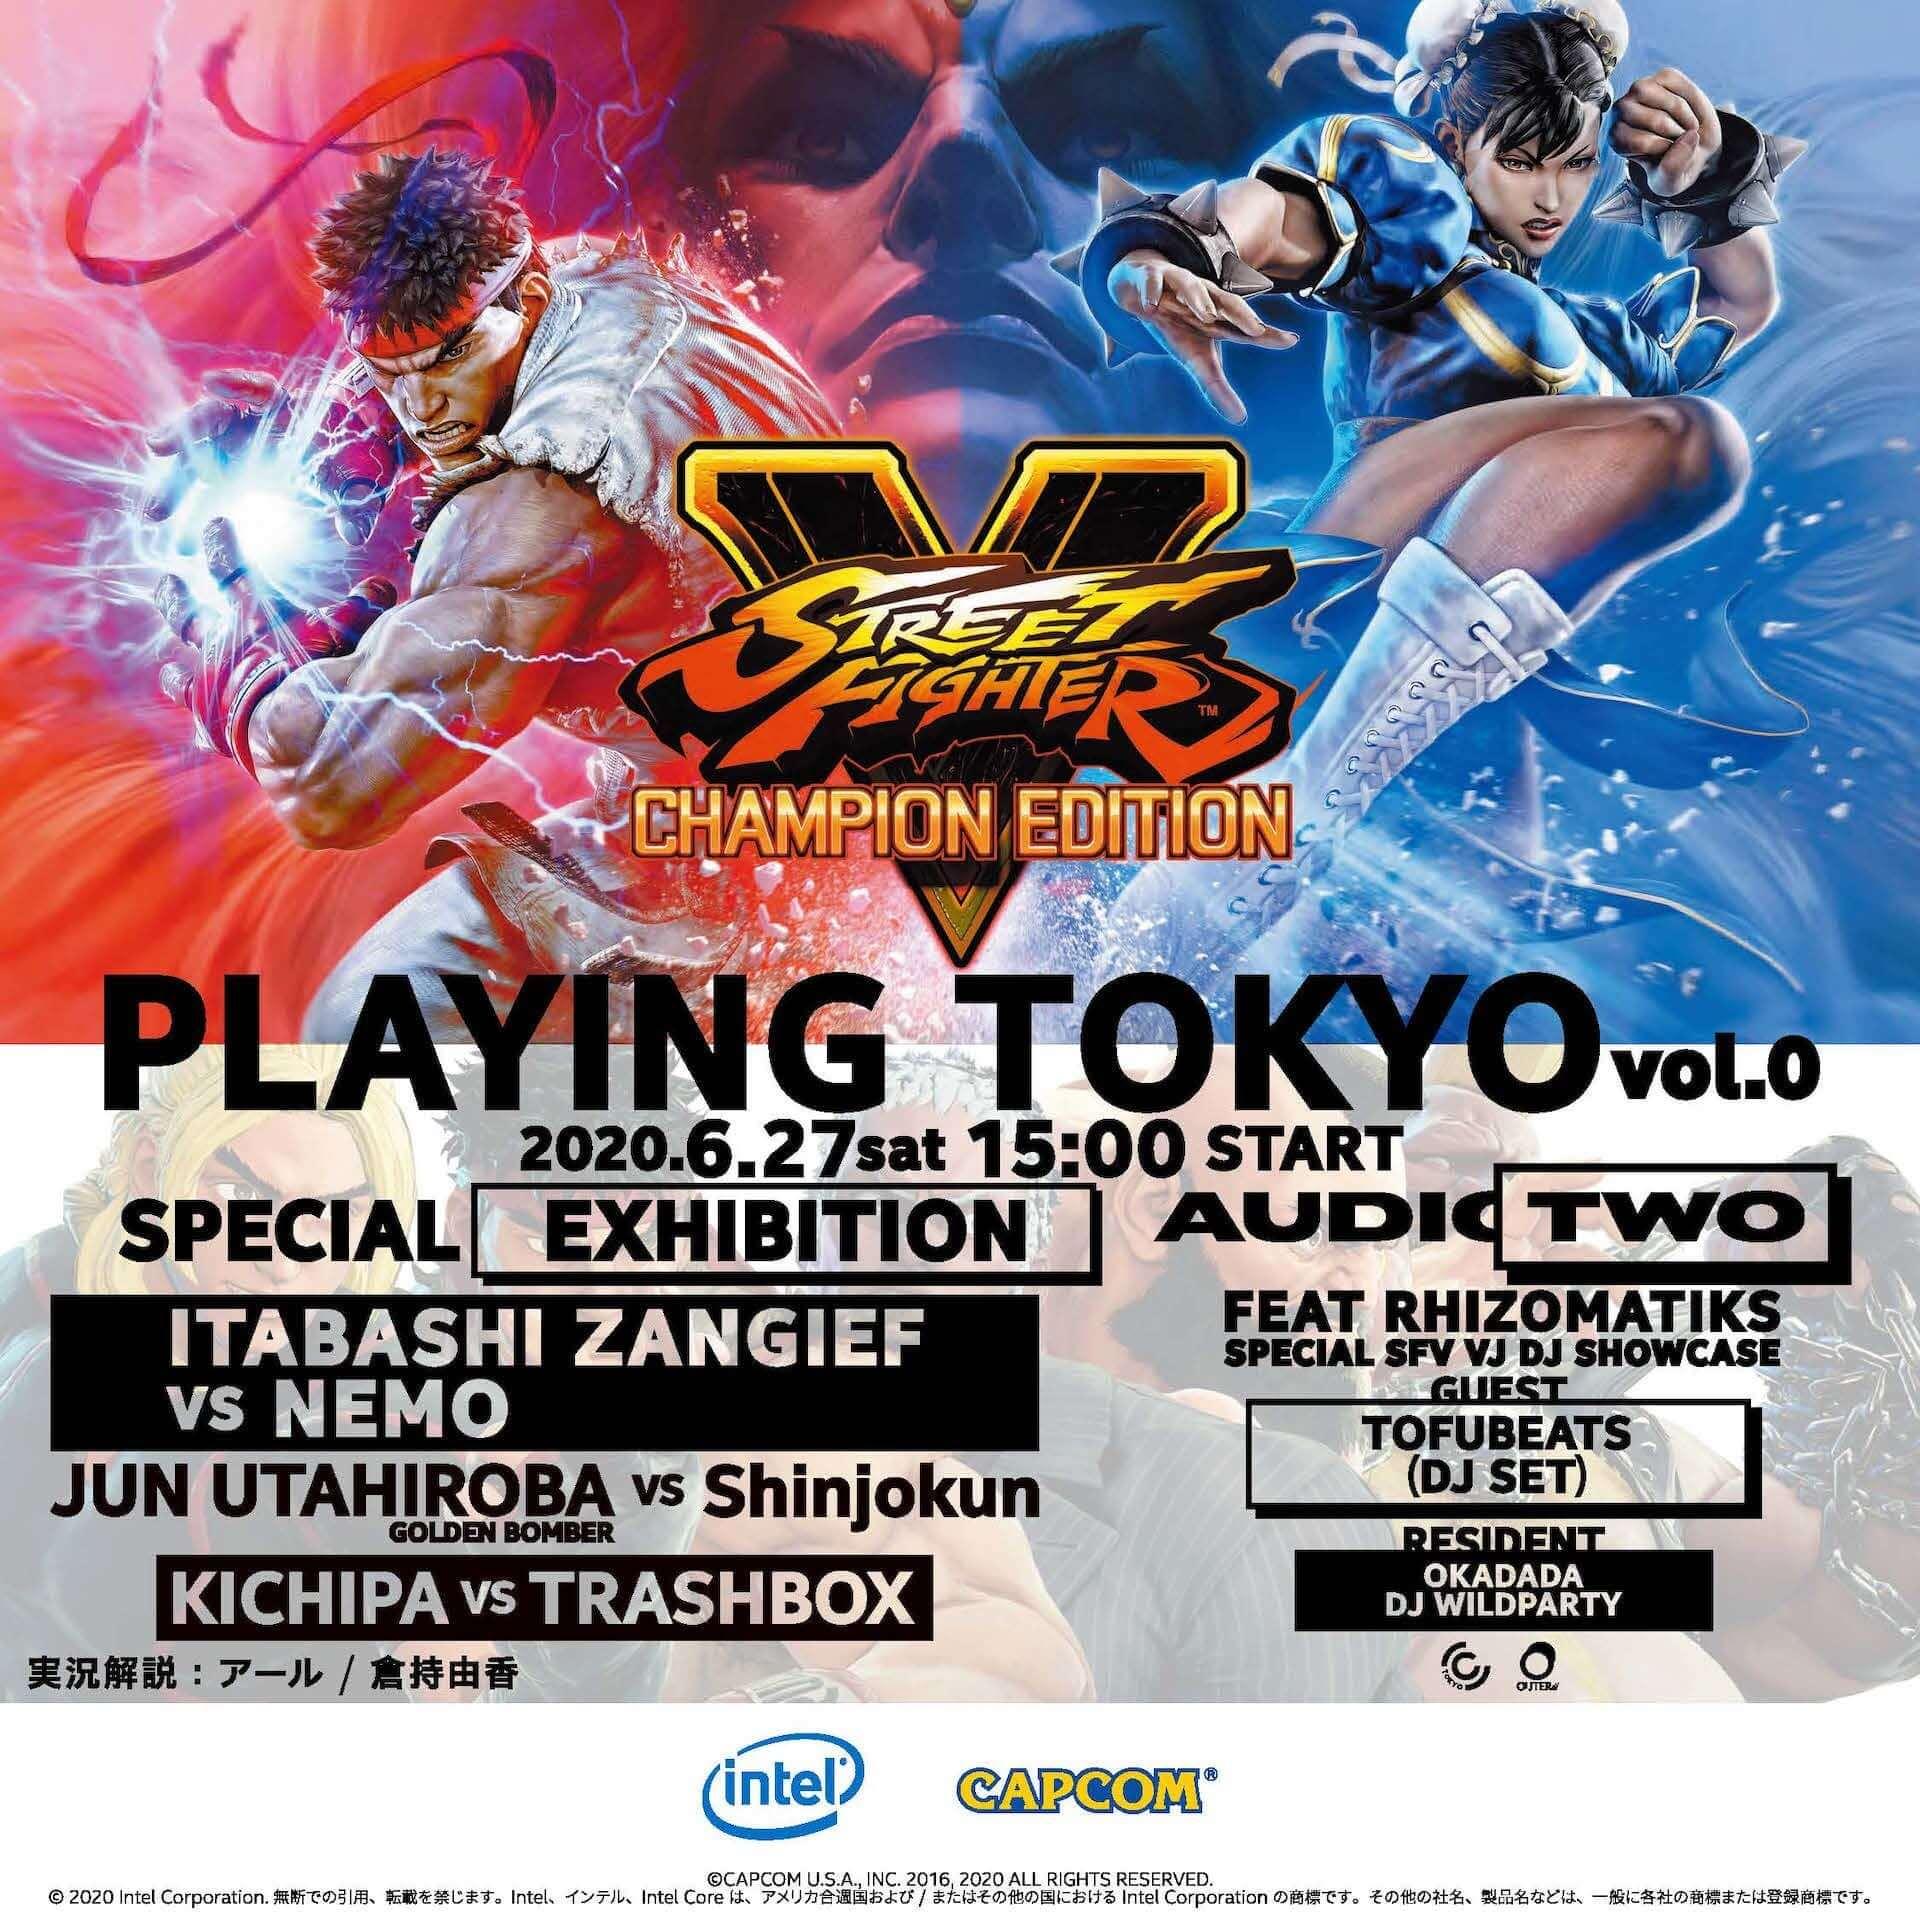 eスポーツとパーティーを繋ぐイベント<Intel Presents. SFV PLAYING TOKYO vol.0>開催決定!tofubeats、okadadaらが登場 tech200623_SFV_main-1920x1920